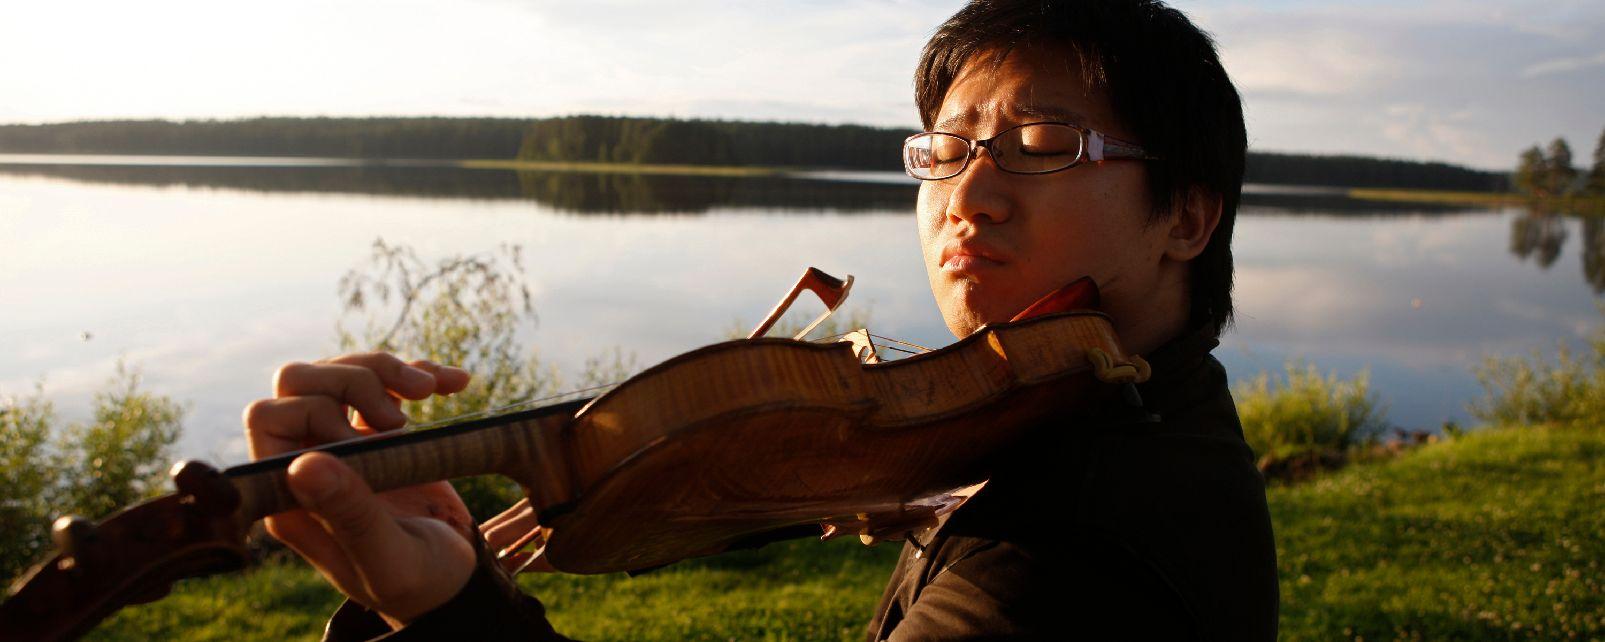 Le festival de Khumo , Das Musikfestival von Kuhmo , Finnland